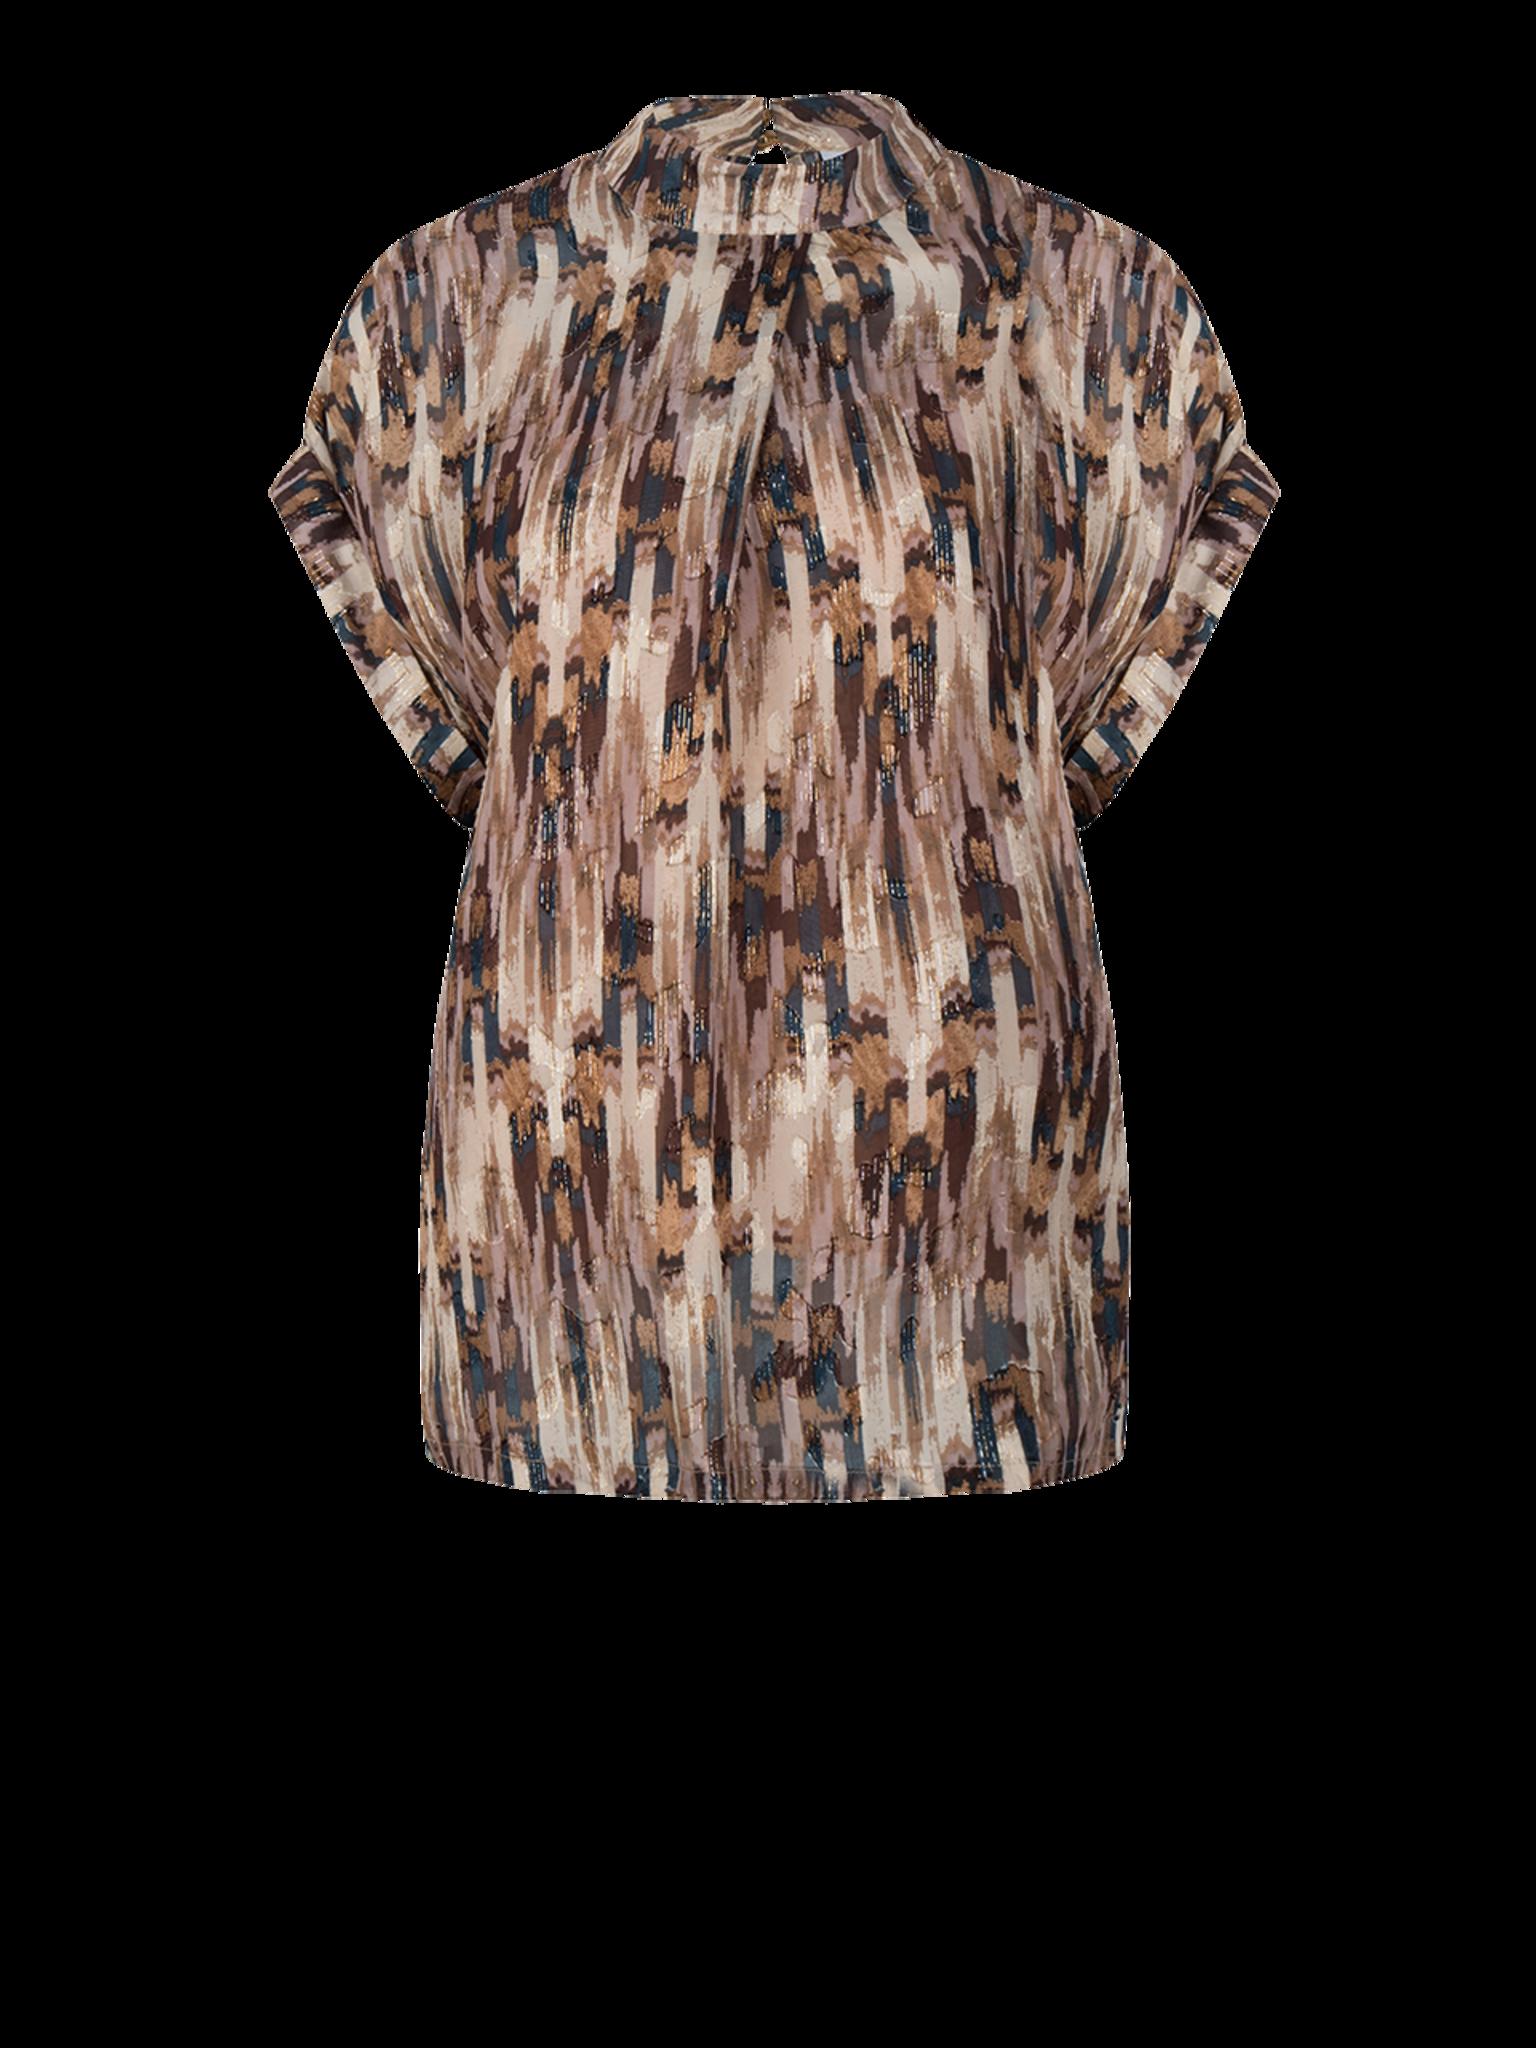 Dante 6 Shirt 204124 NEPTUNE-1